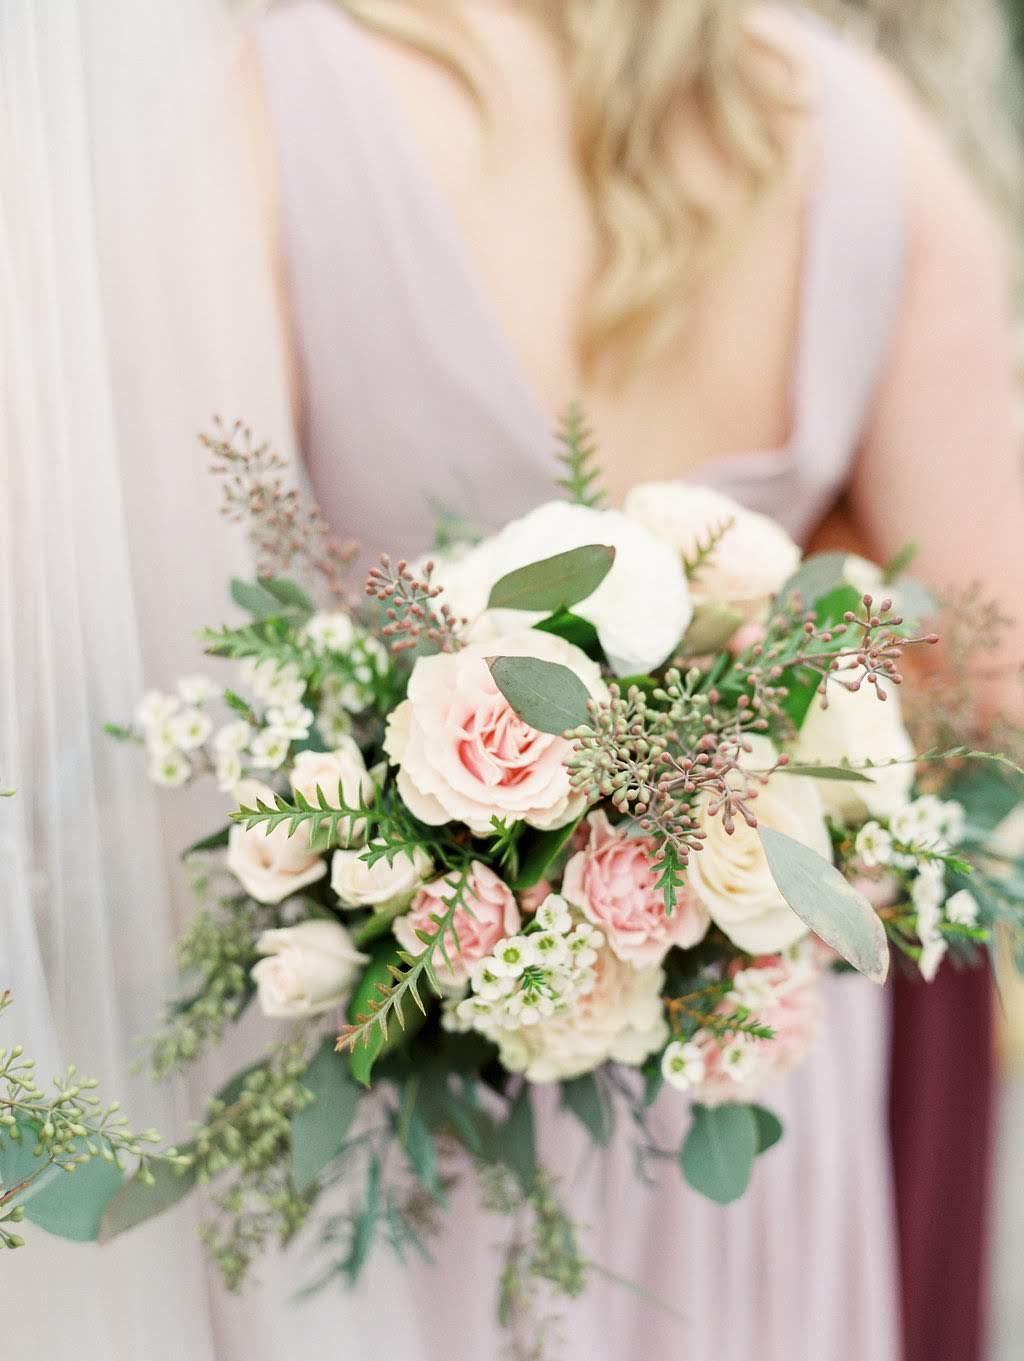 Dani-Cowan-Photography-Texas-Wedding-Film-Photographer73.jpg